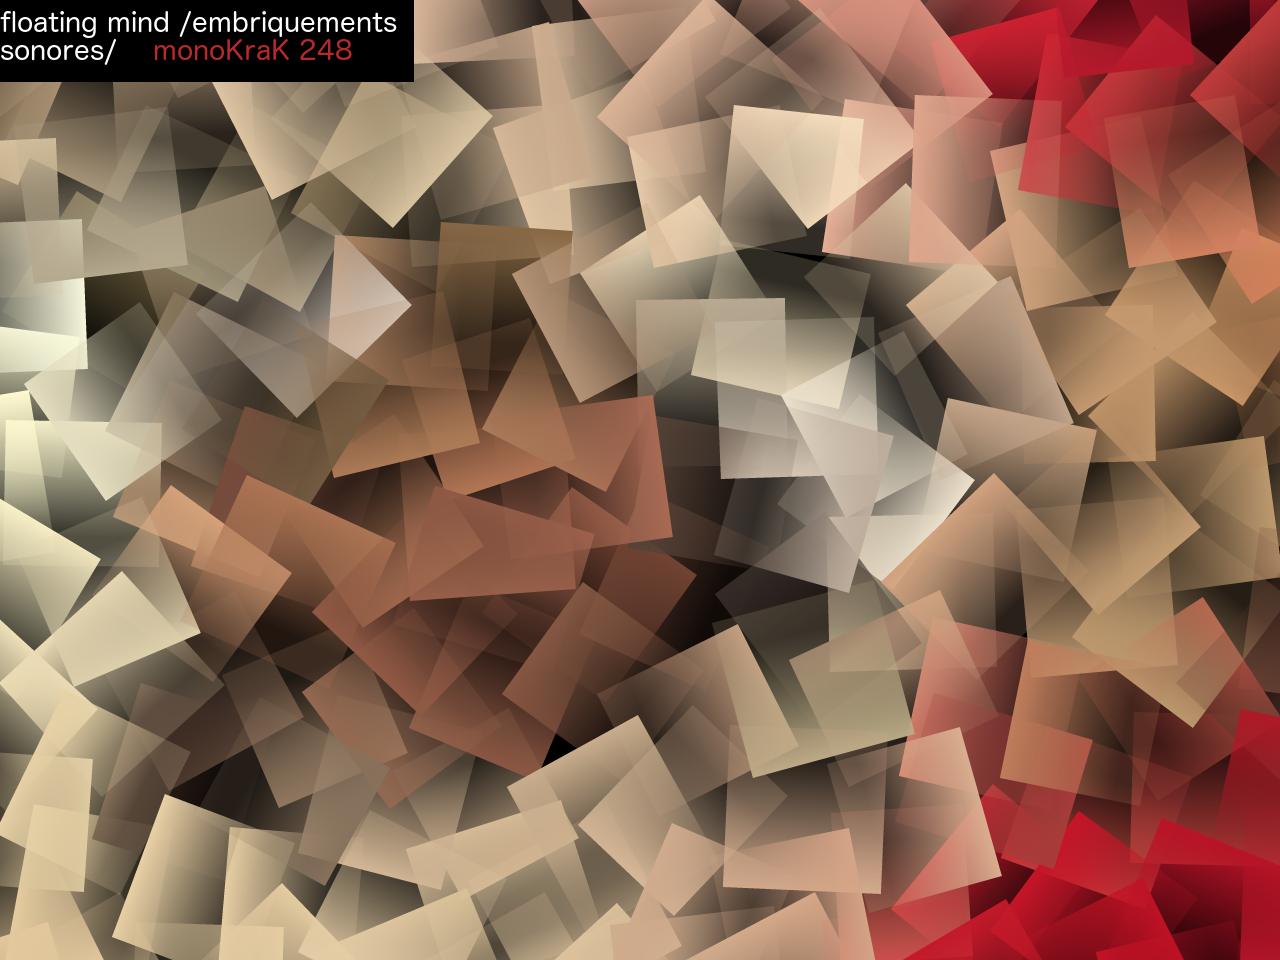 Floating Mind – Embriquements Sonores